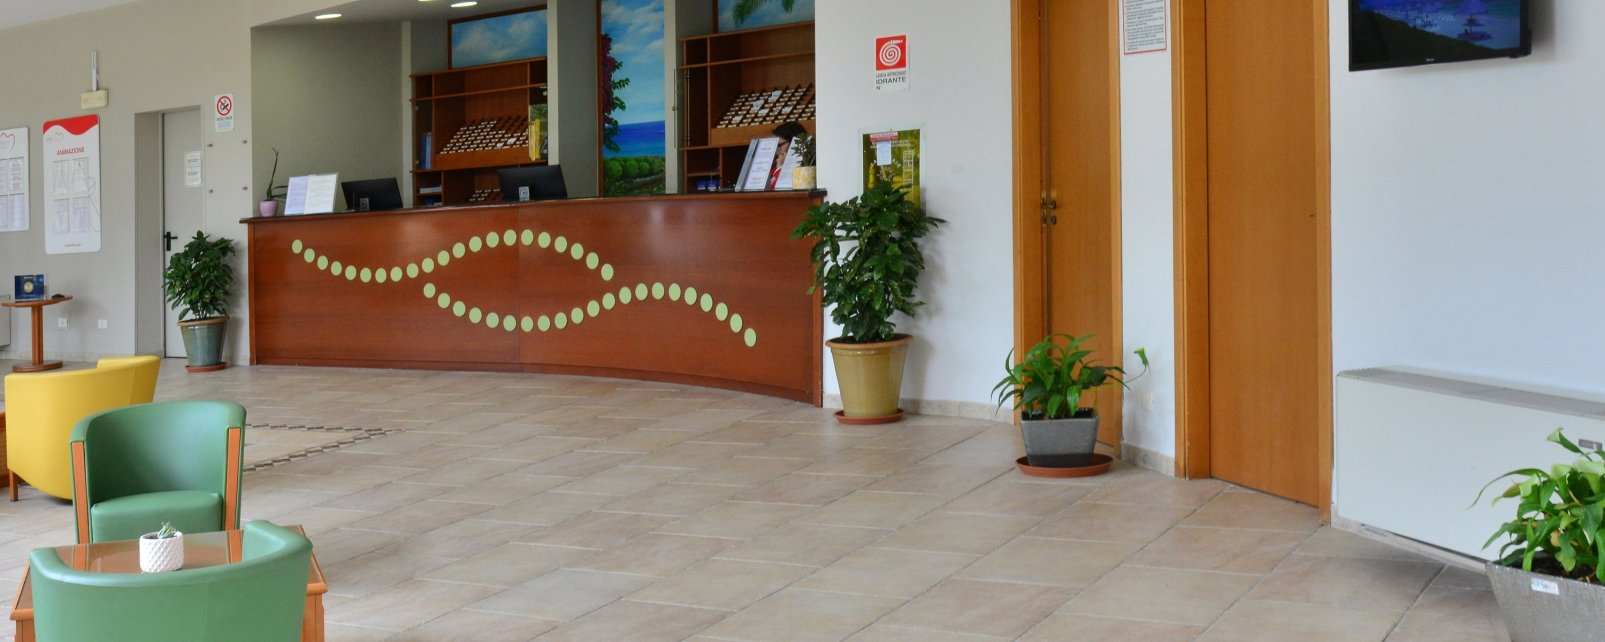 Hotel arenella resort siracusa italia for Hotel resort siracusa